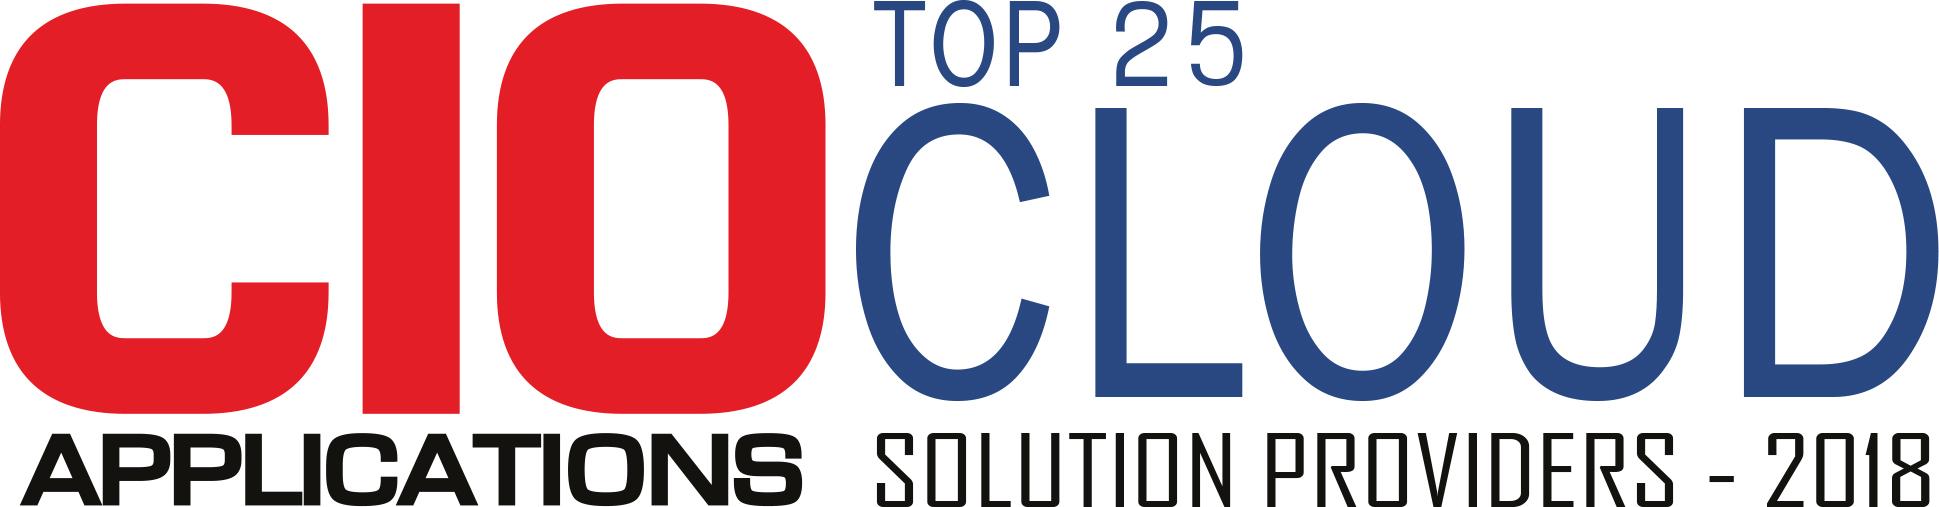 Top 25 Companies Providing Cloud Solution  - 2018